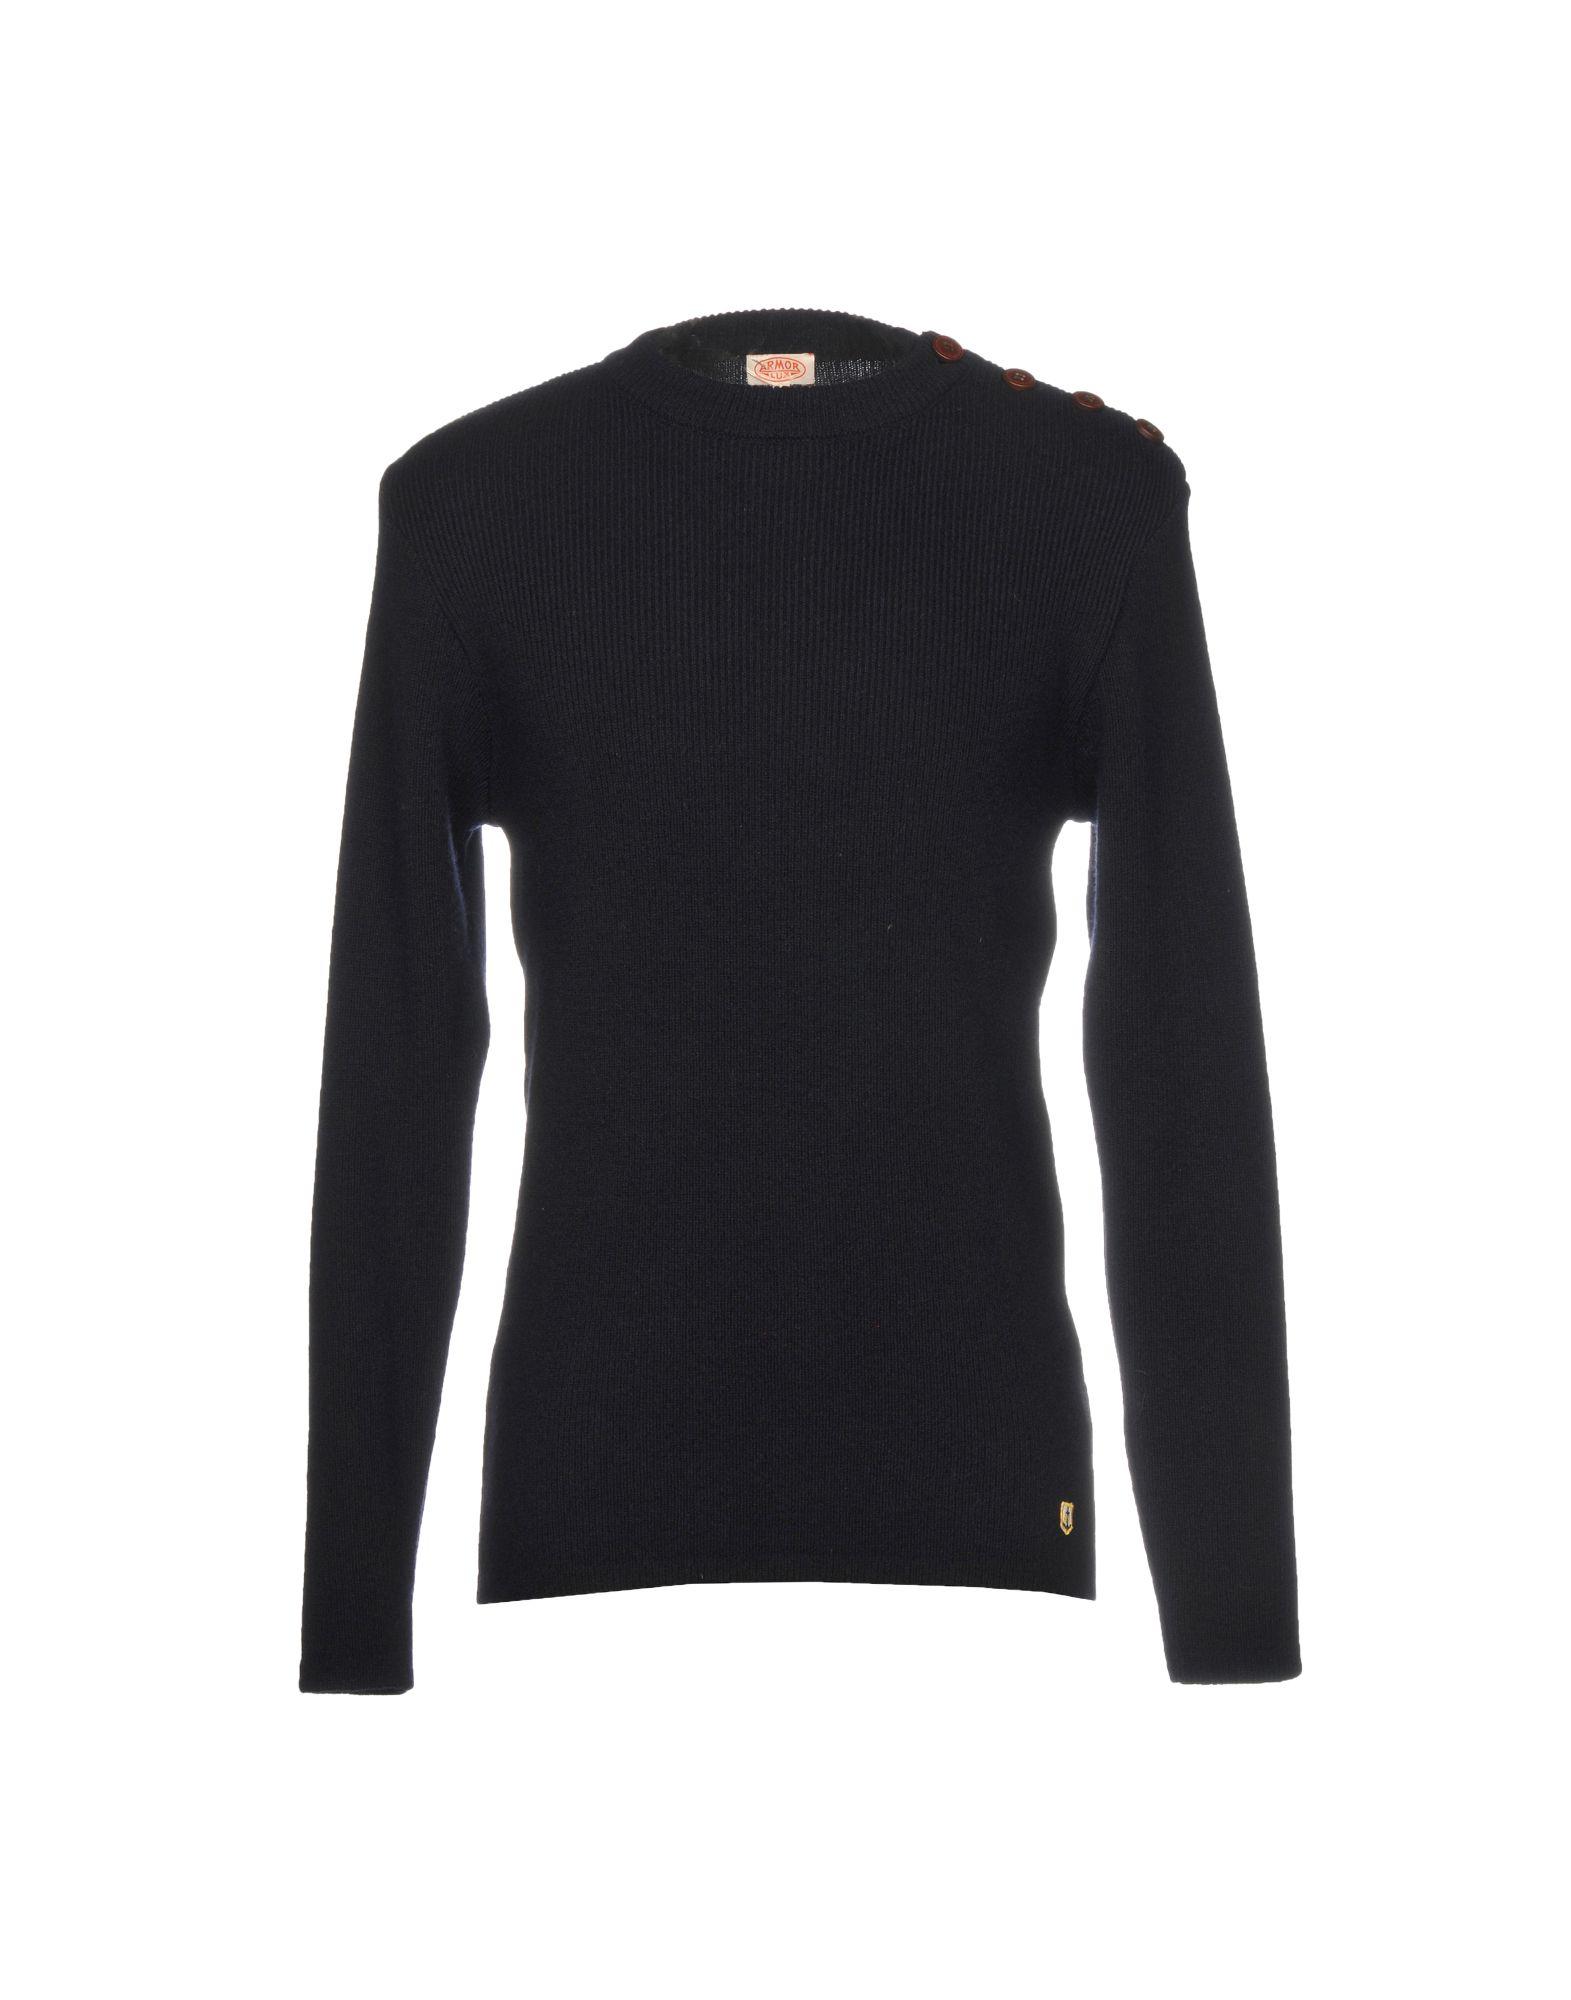 ARMOR-LUX Свитер свитер lux style цвет синий